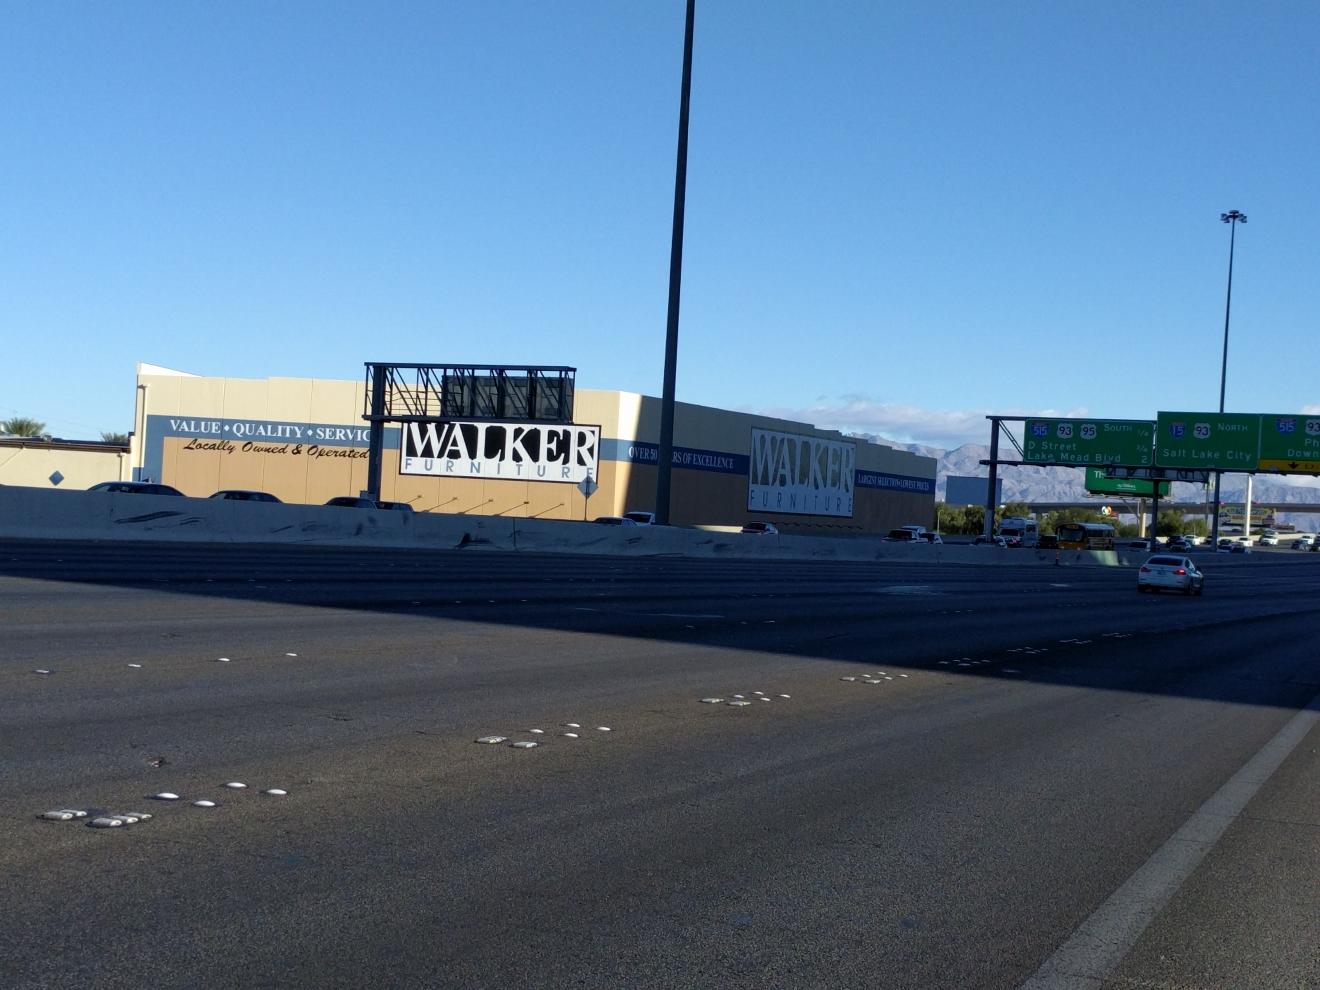 Nearly 300,000 Vehicles Go Through The Interstate 15 Corridor Between The  Spaghetti Bowl And Sahara Avenue